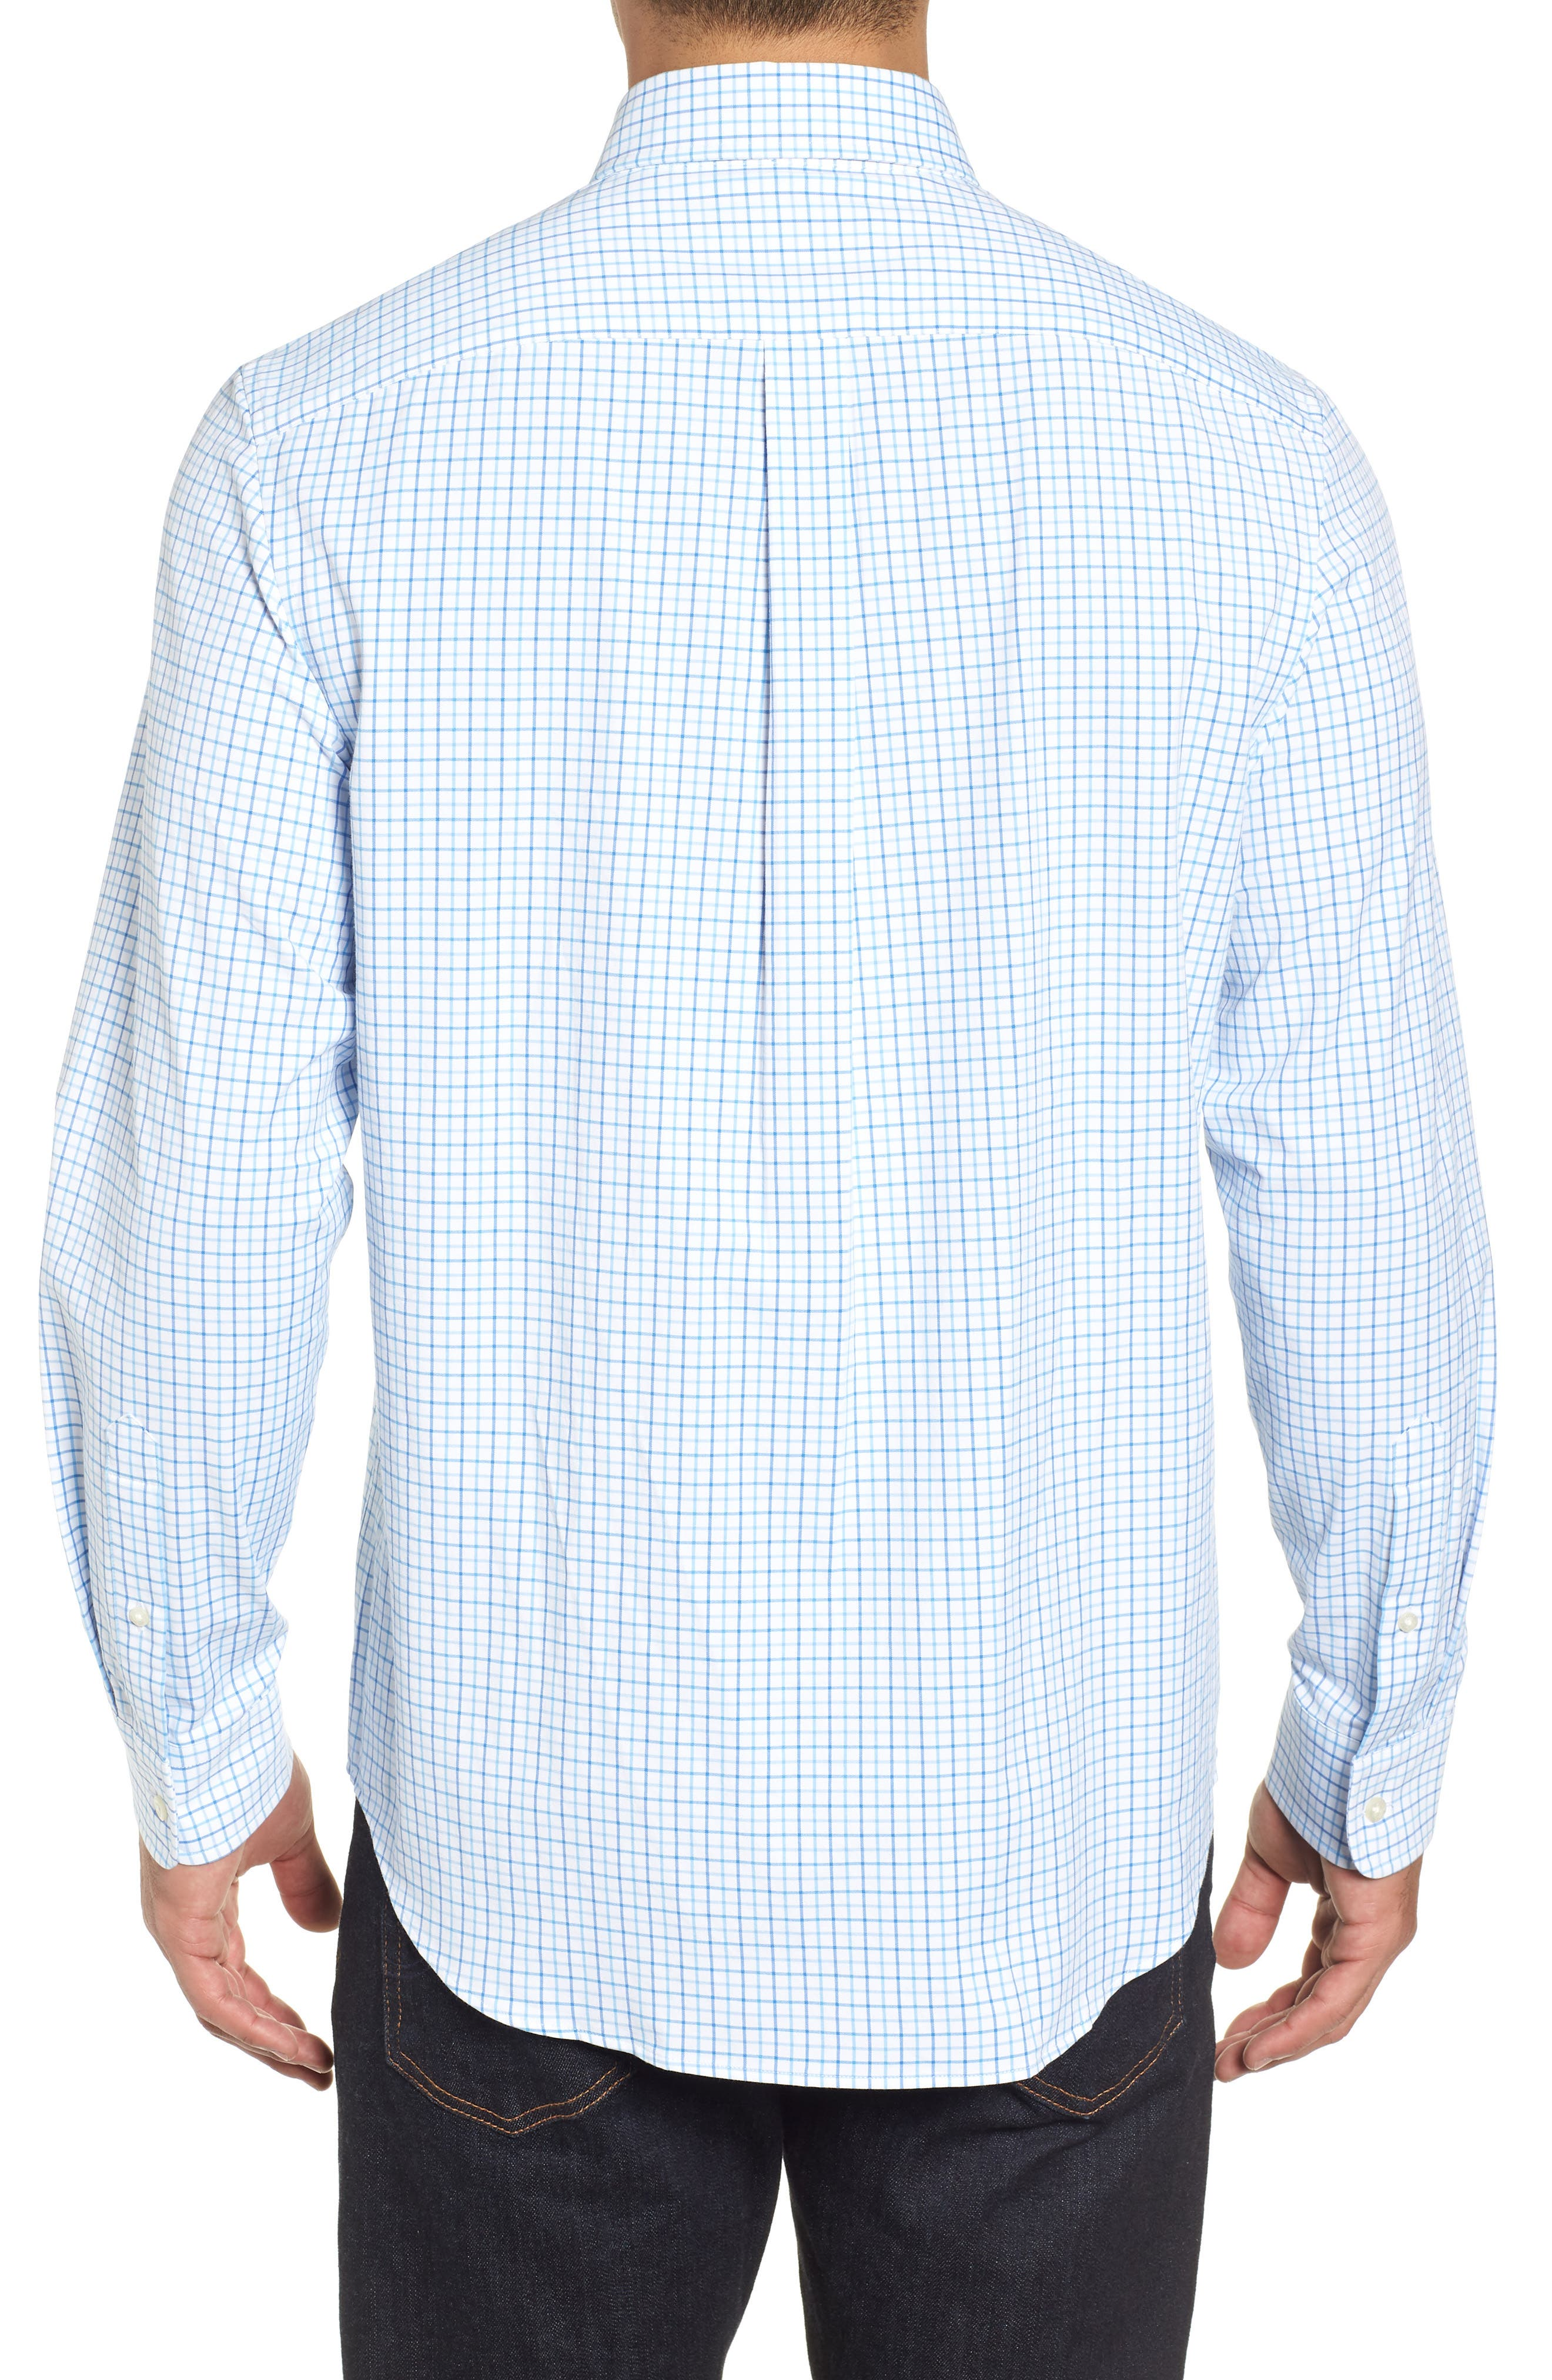 Pepperbush Regular Fit Plaid Sport Shirt,                             Alternate thumbnail 3, color,                             427